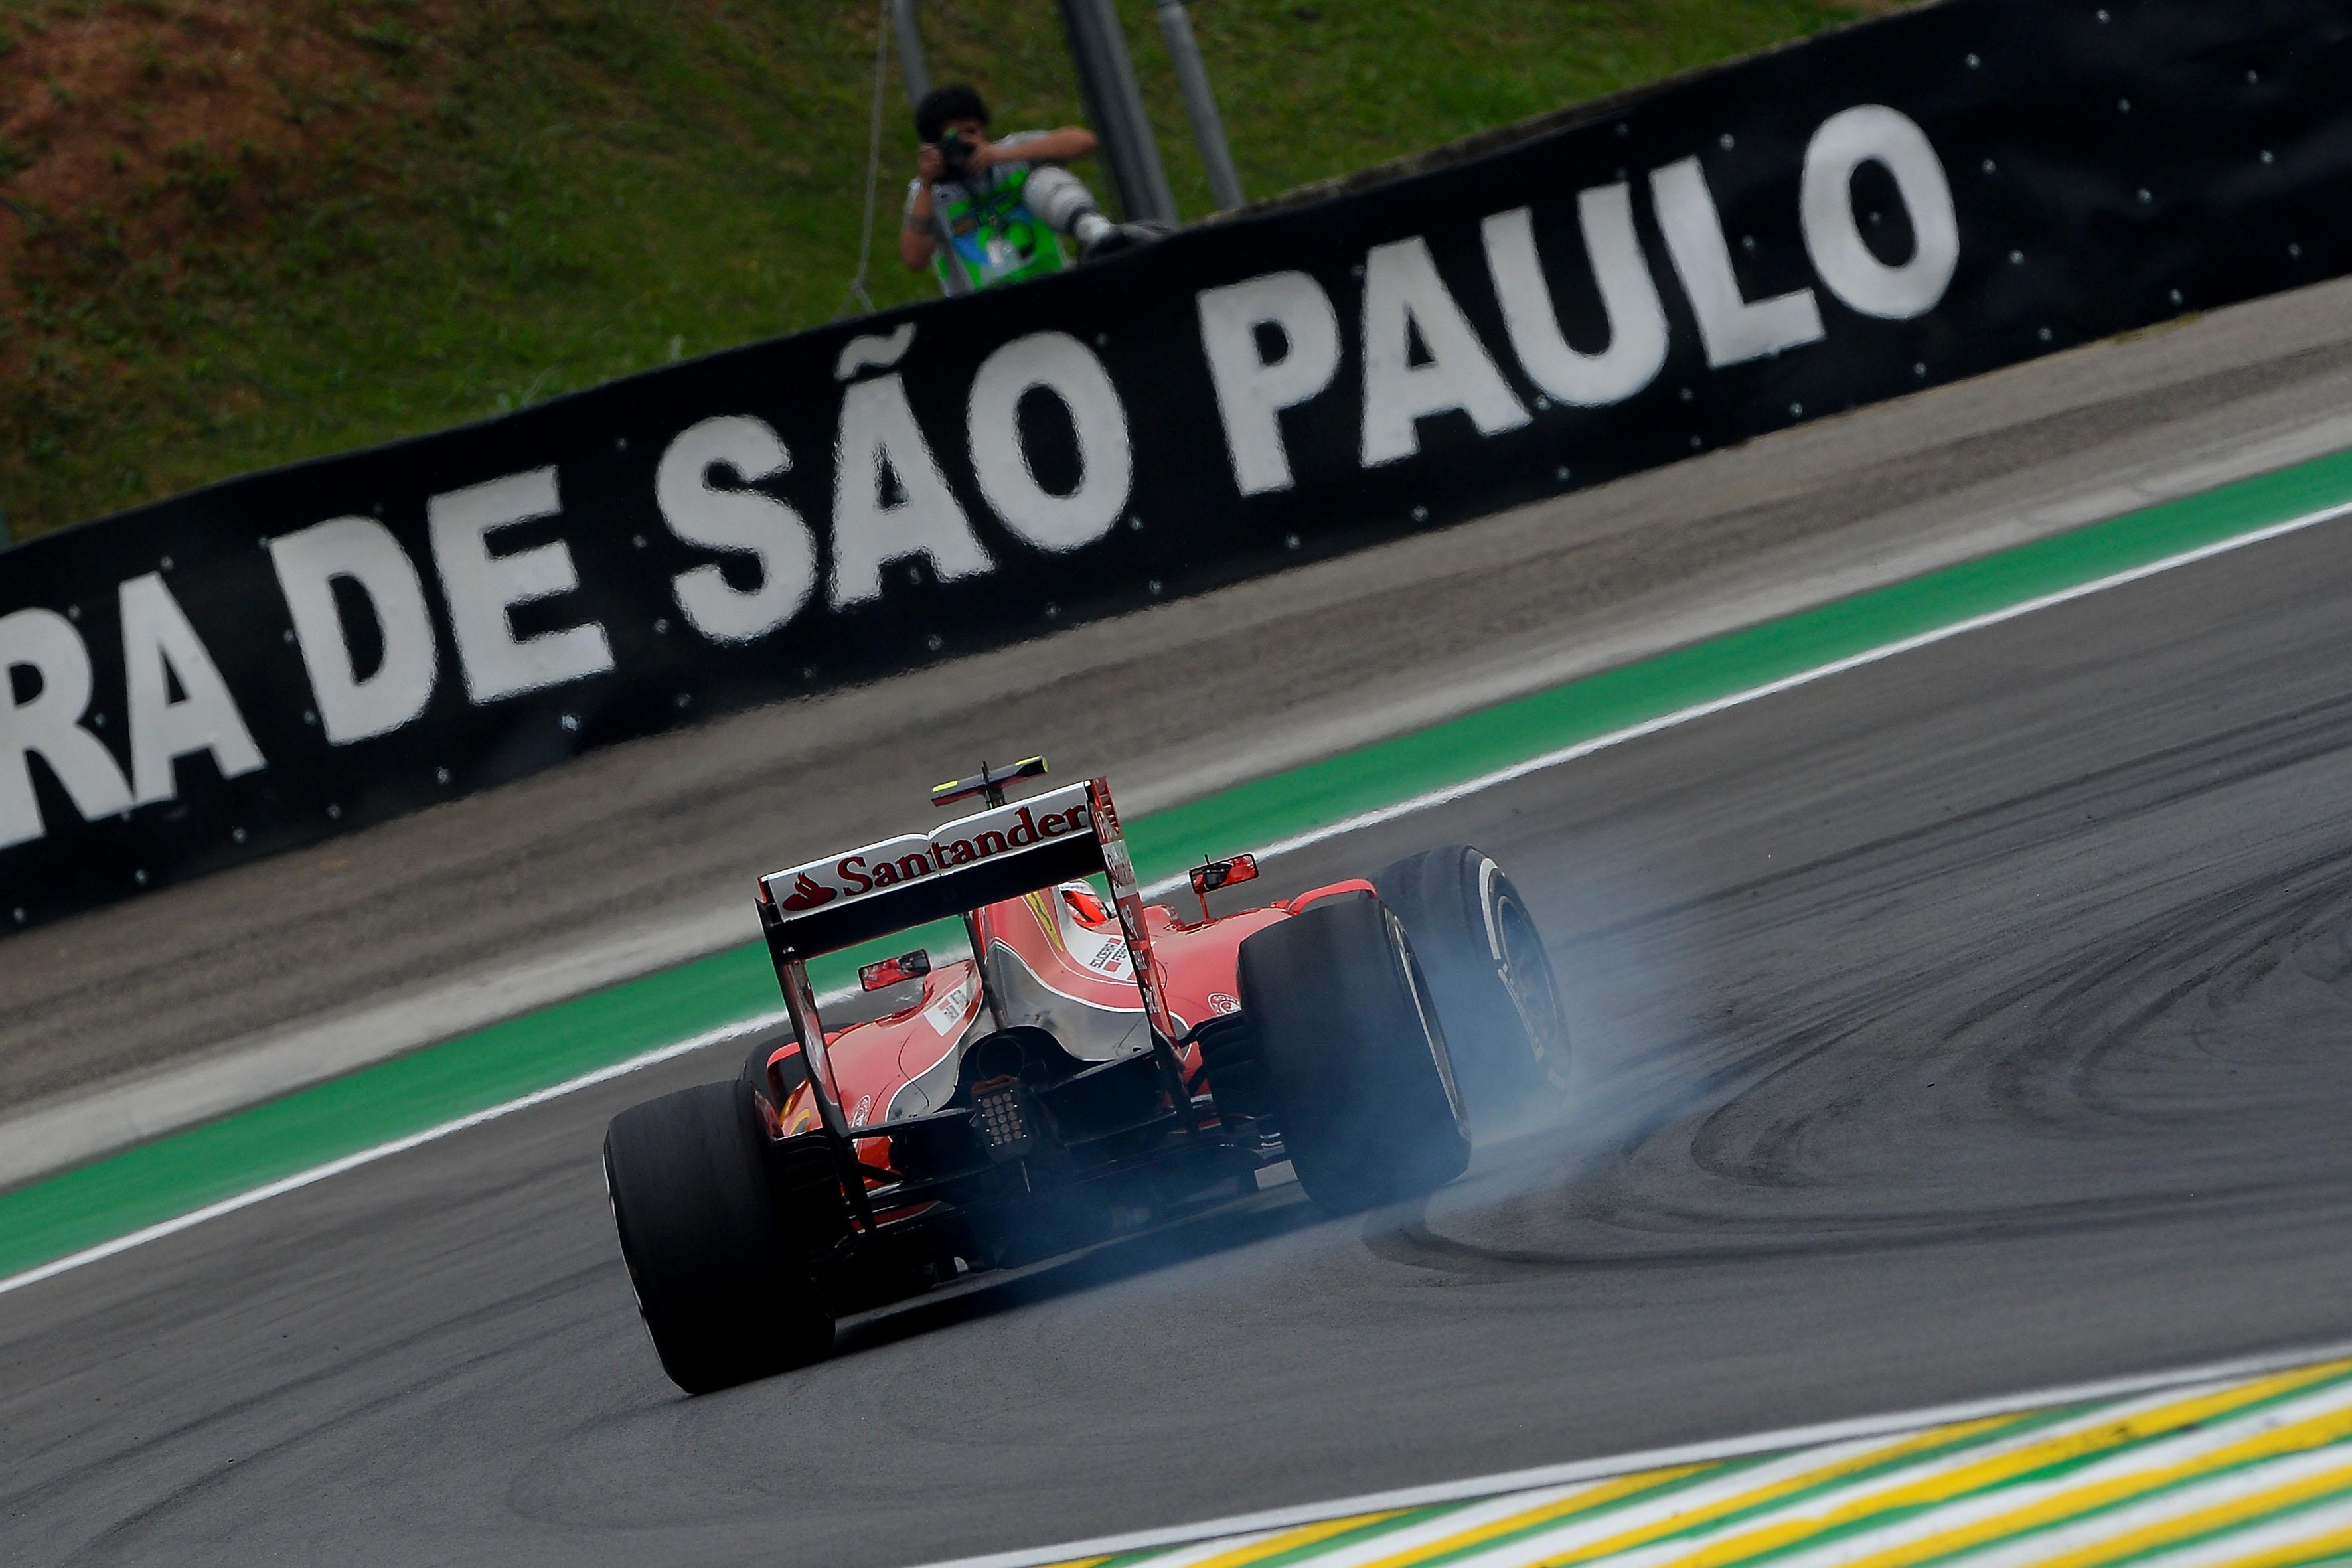 GP Brasile: set e mescole scelti dai piloti